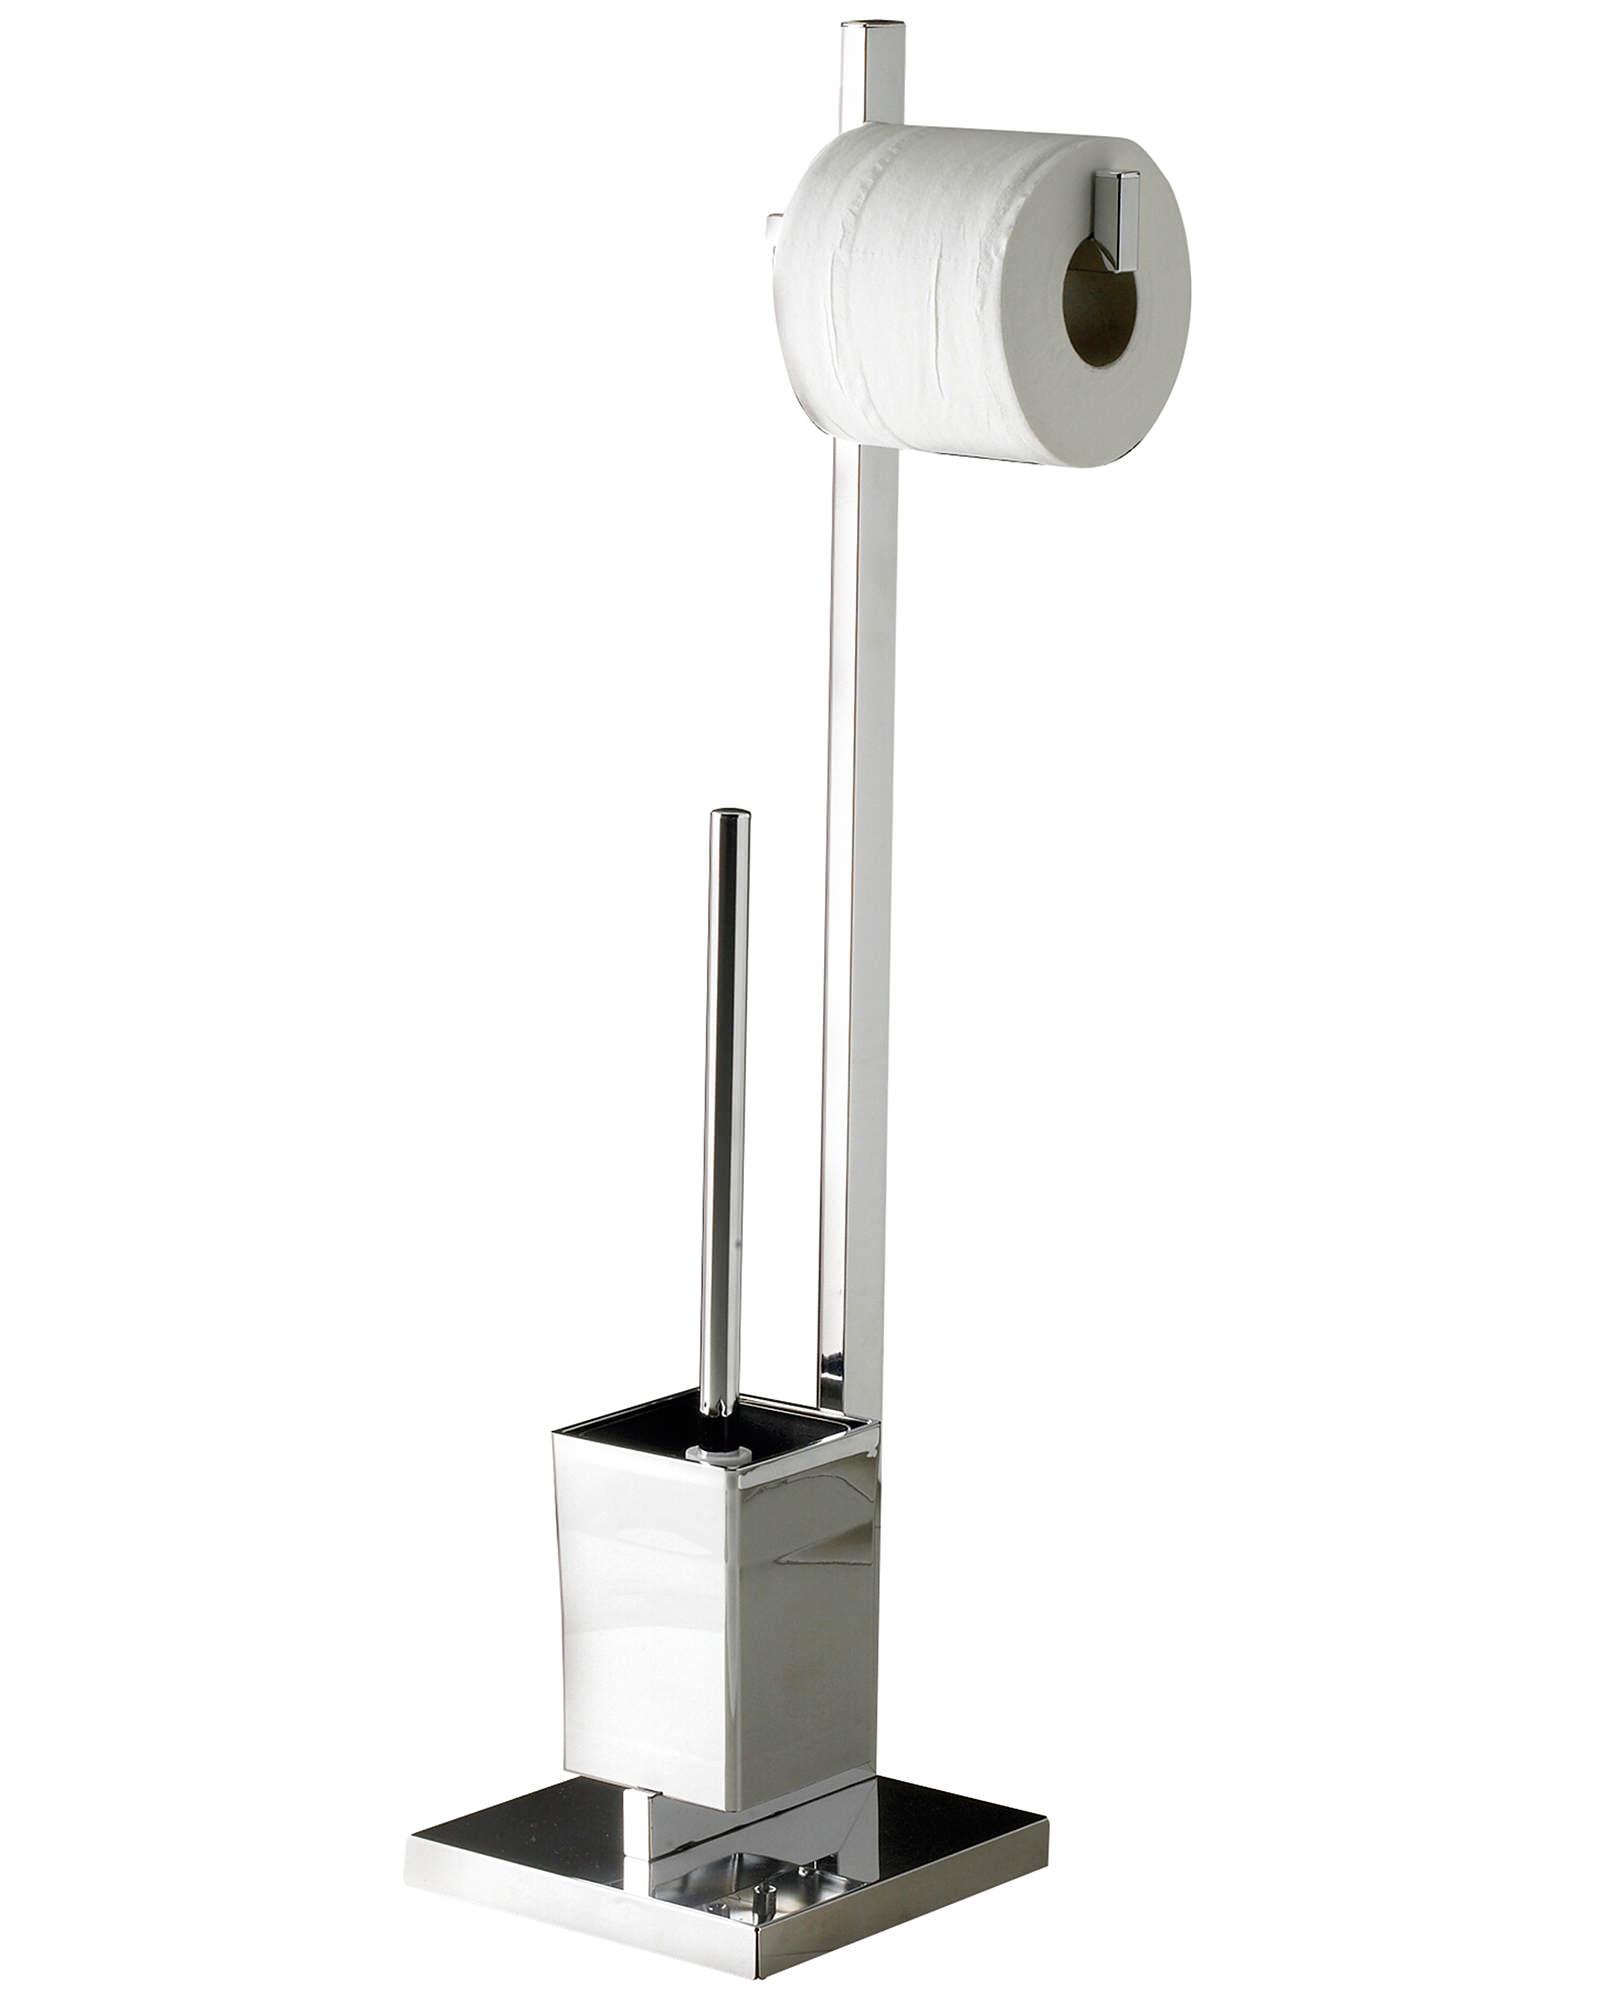 Sagittarius Madison Free Standing Toilet Brush And Roll